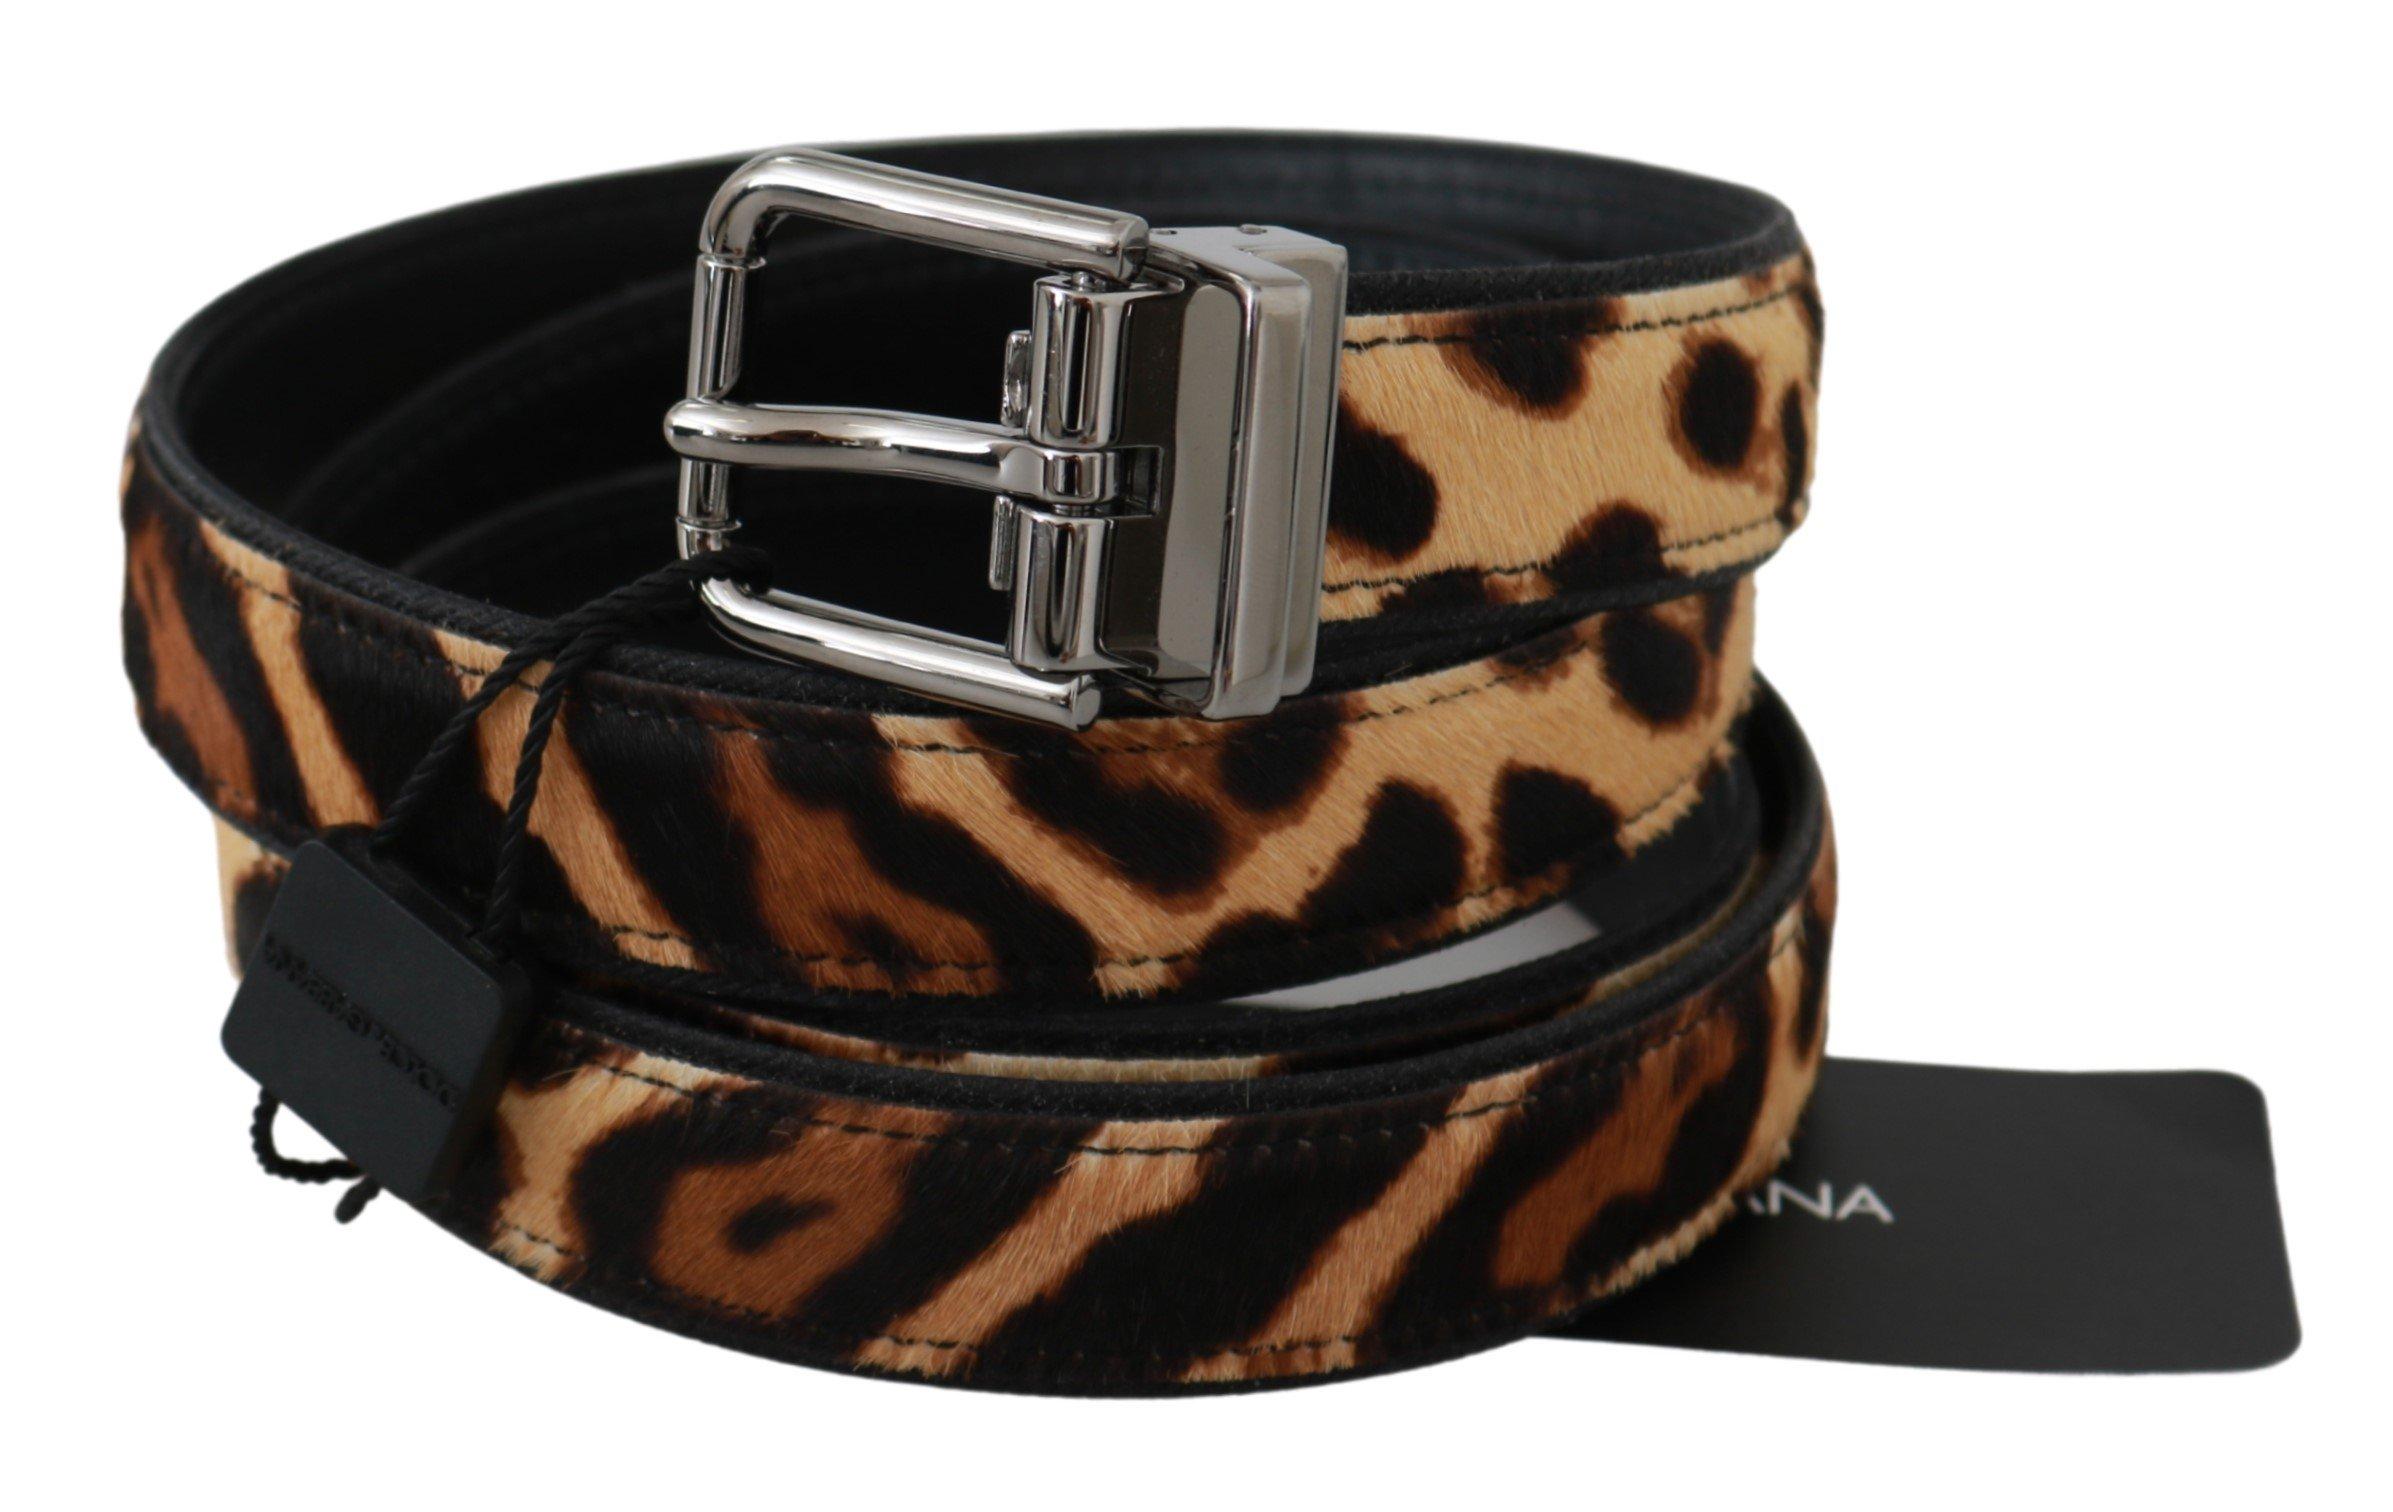 Dolce & Gabbana Men's Patterned Buckle Leather Belt Brown BEL60606 - 100 cm / 40 Inches